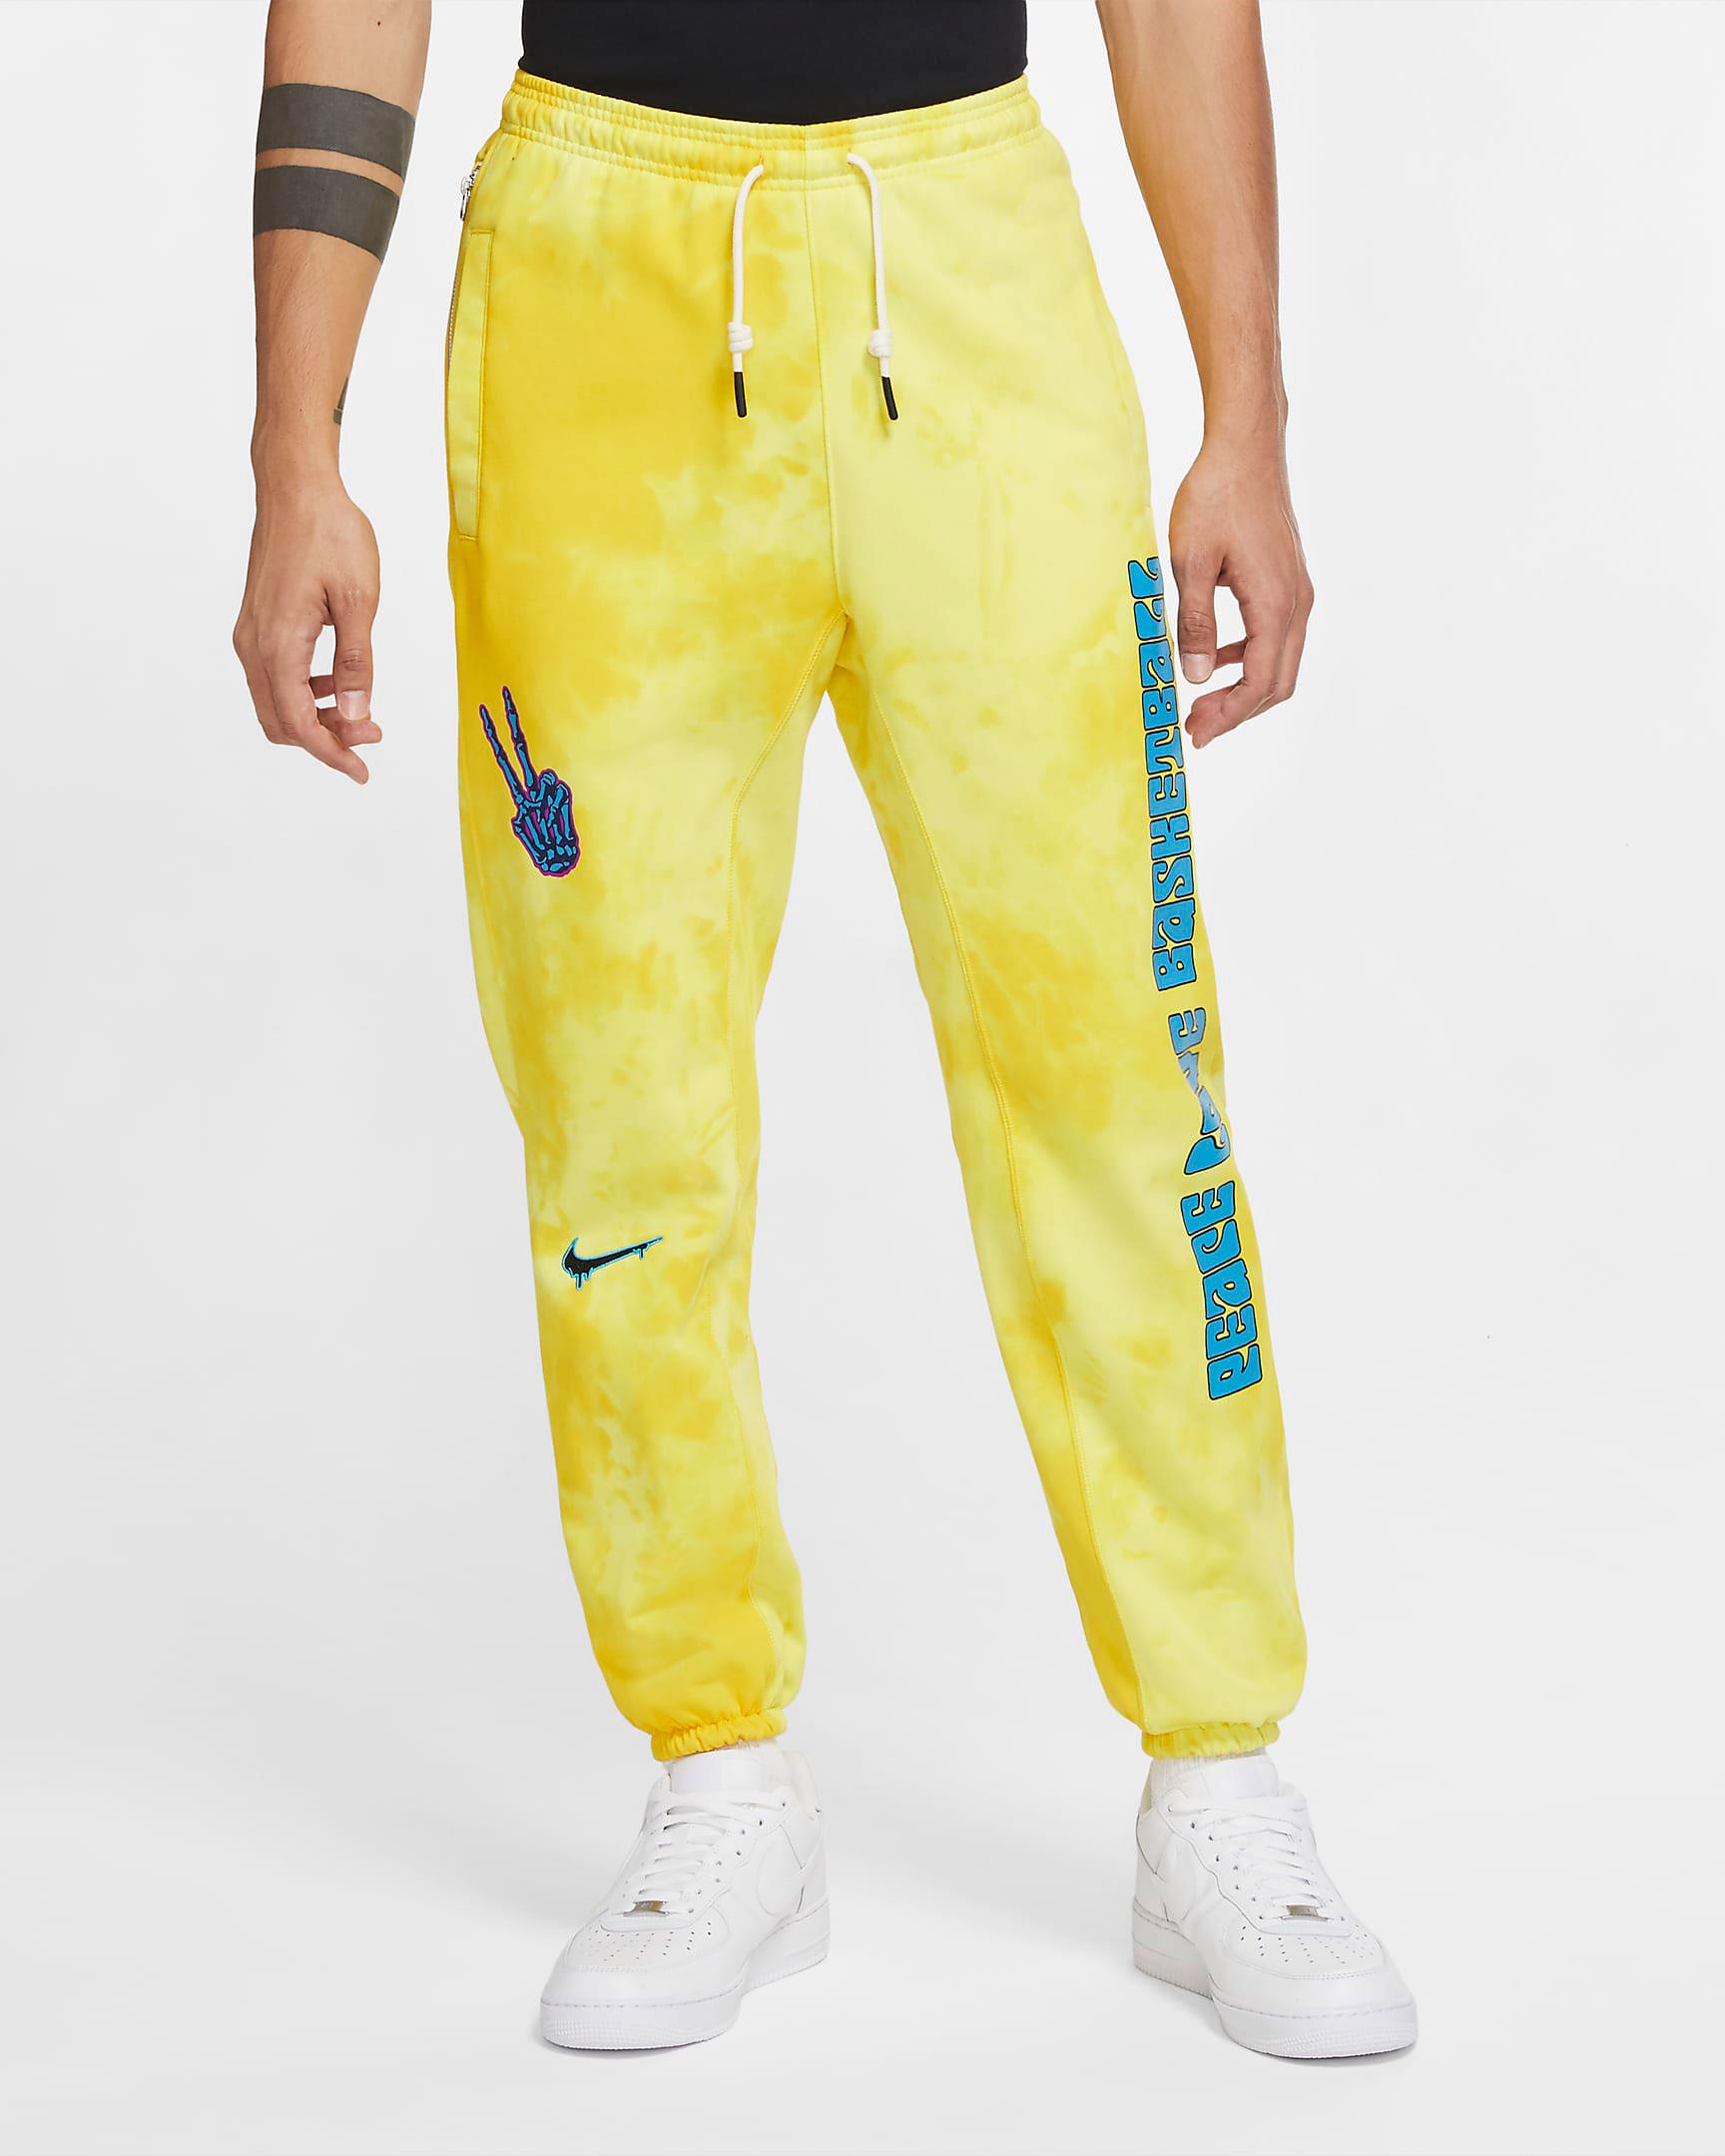 nike-peace-love-basketball-pants-yellow-1